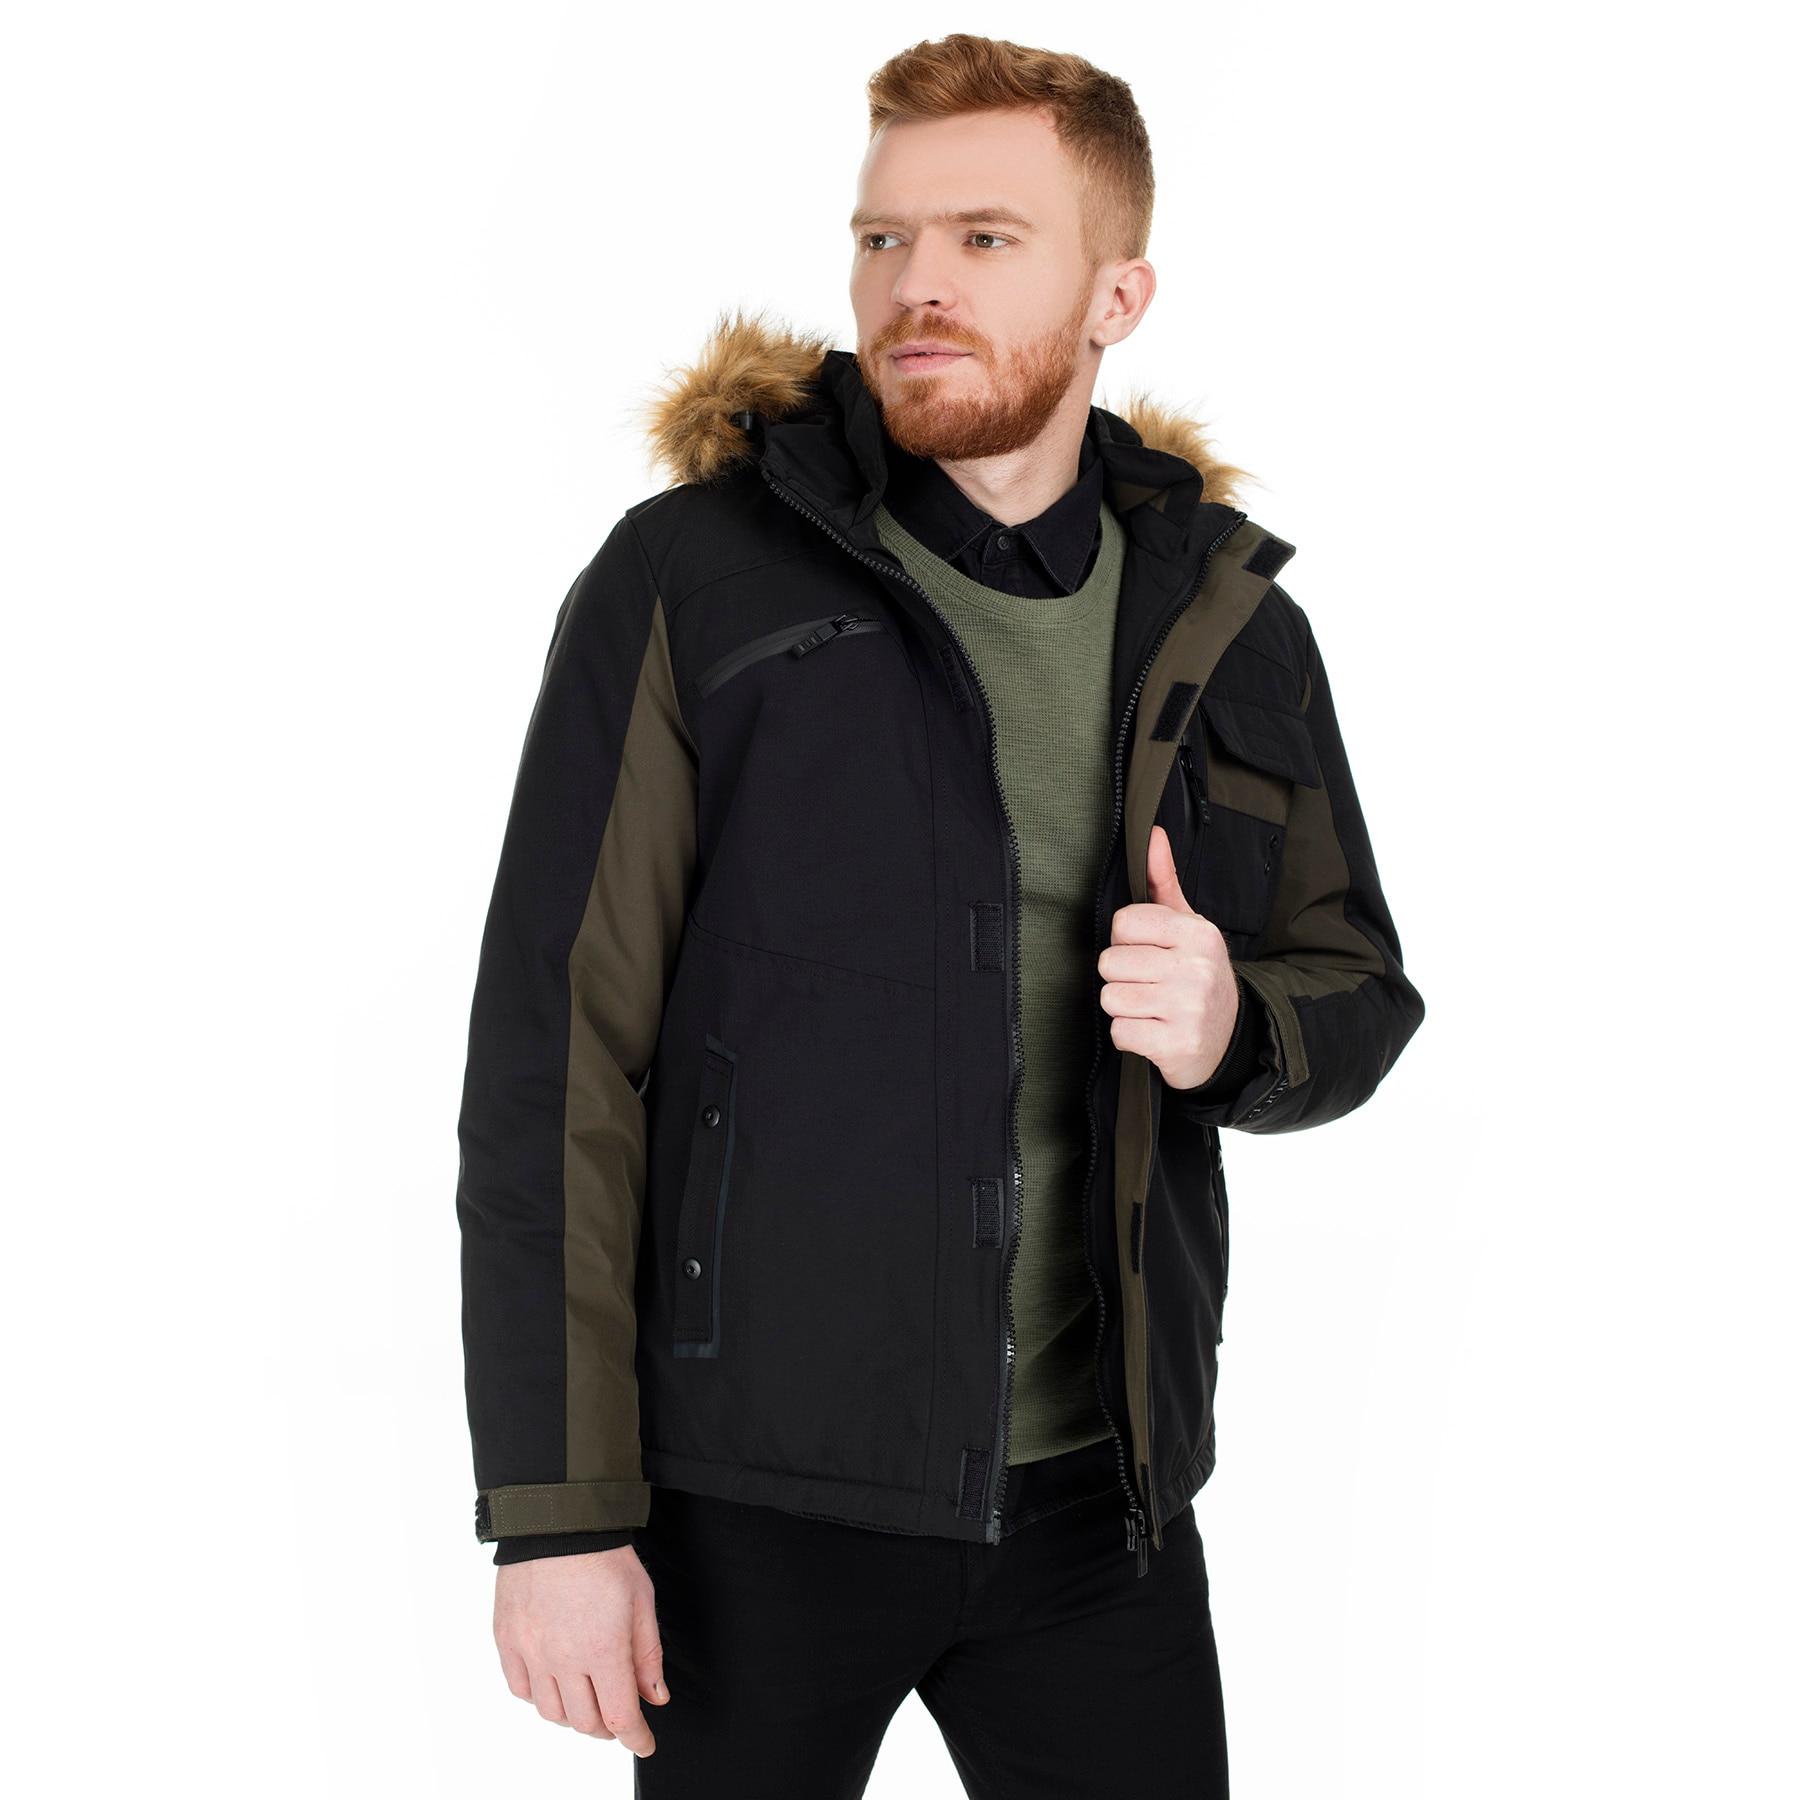 Pique Narrow Cut Hooded Coat MALE COAT 497GARCIA